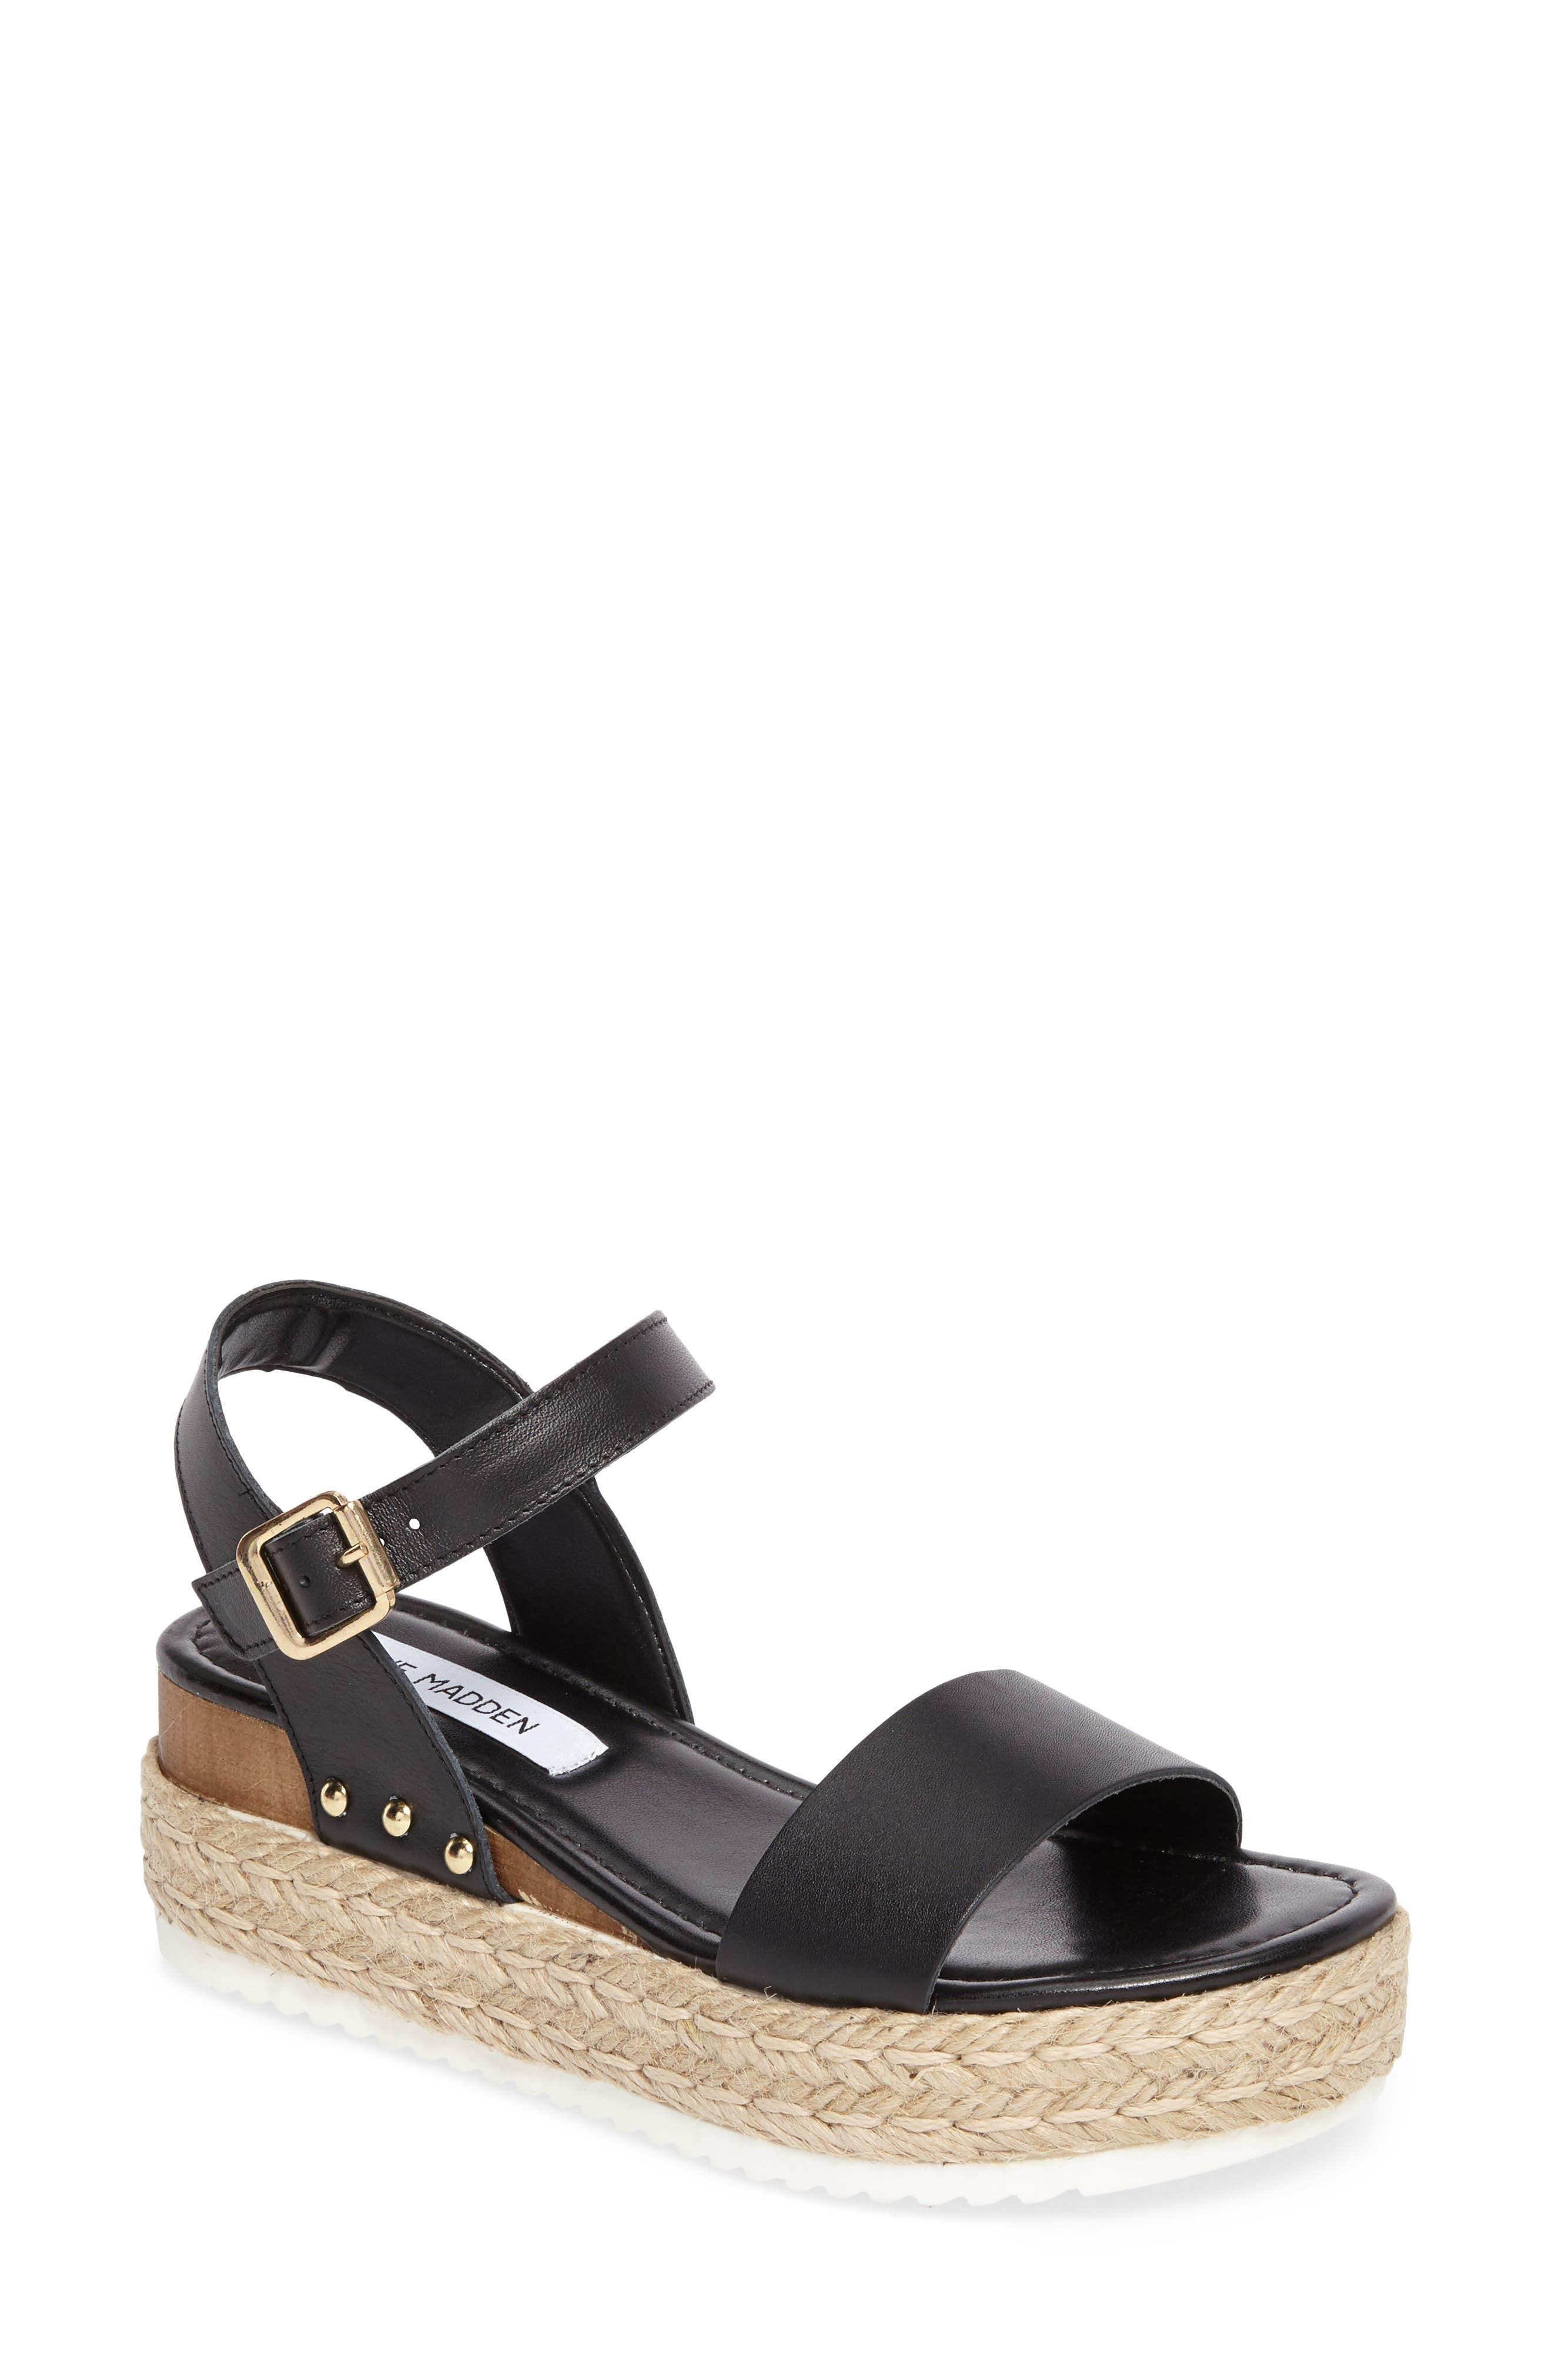 Chiara Platform Espadrille Sandal,                         Main,                         color, Black Leather